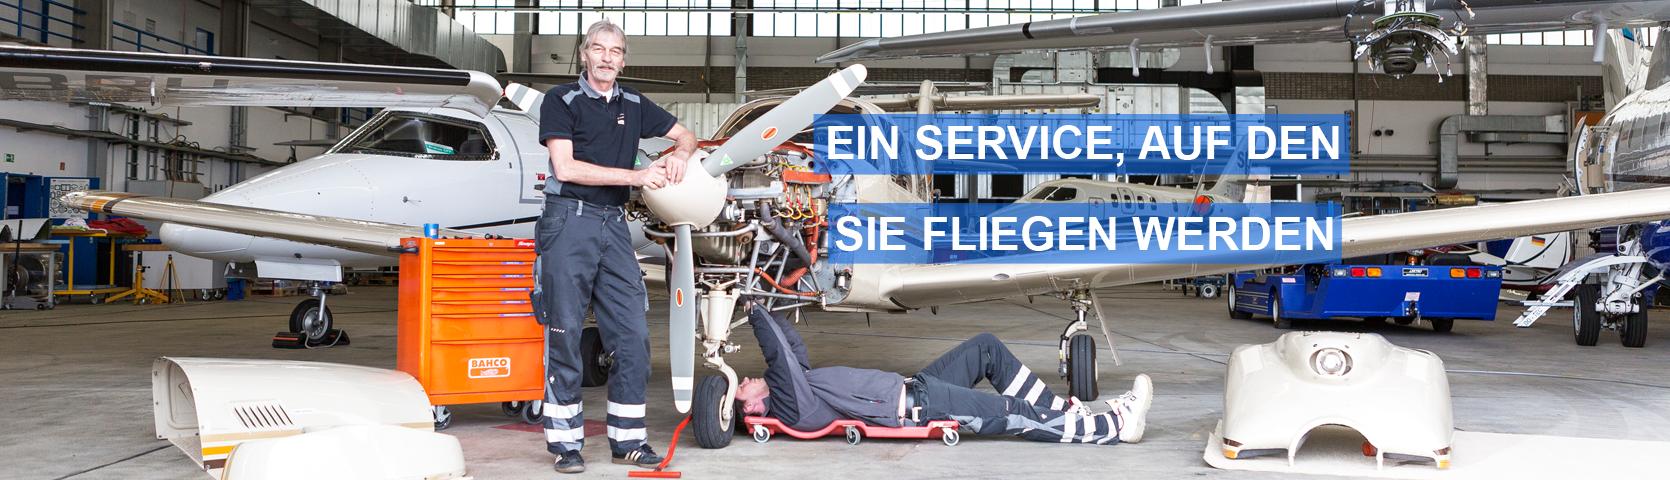 DOTEC GmbH Flugzeugwartung